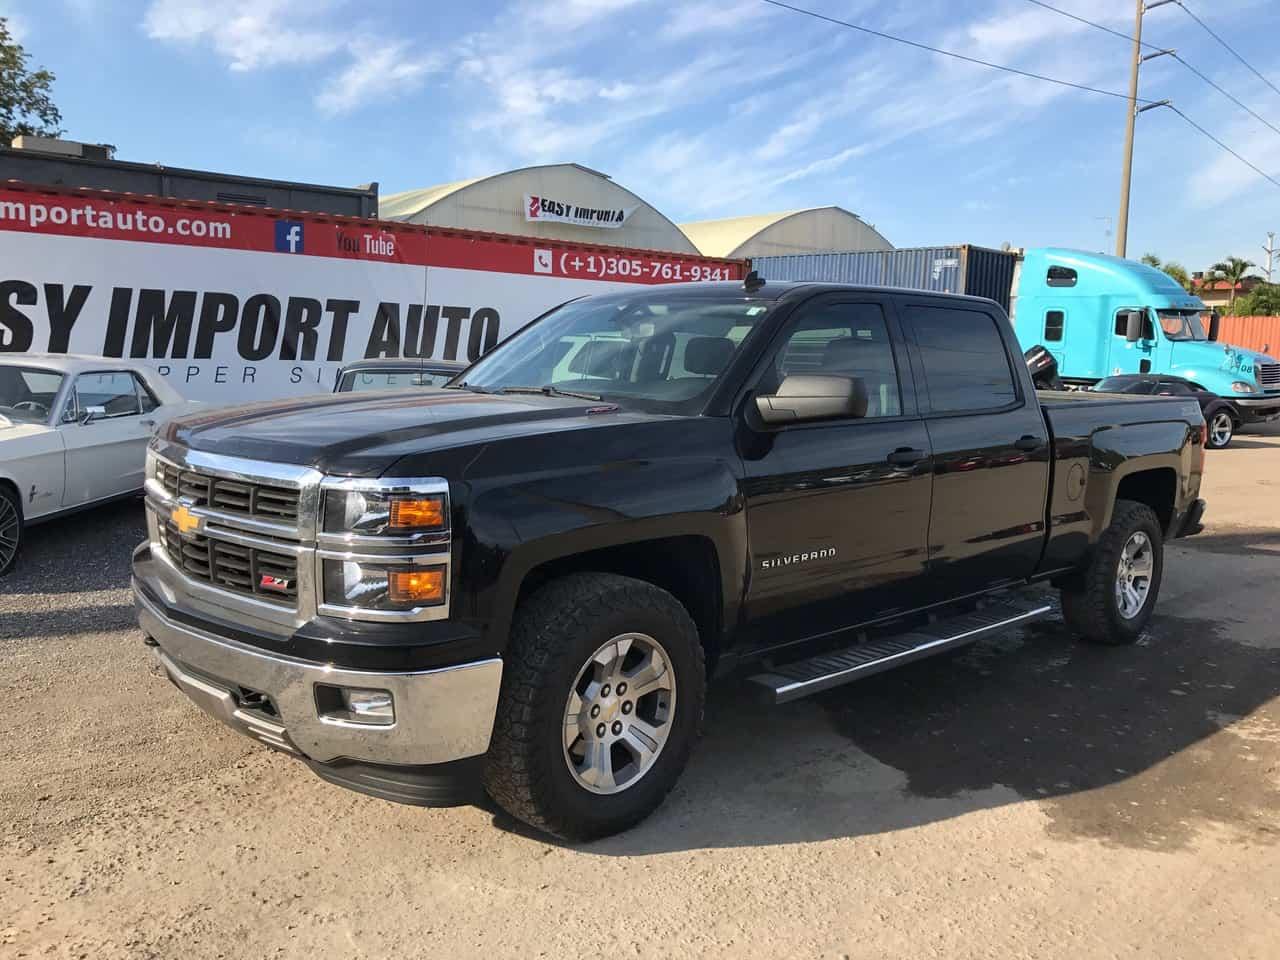 Import Pick-up US